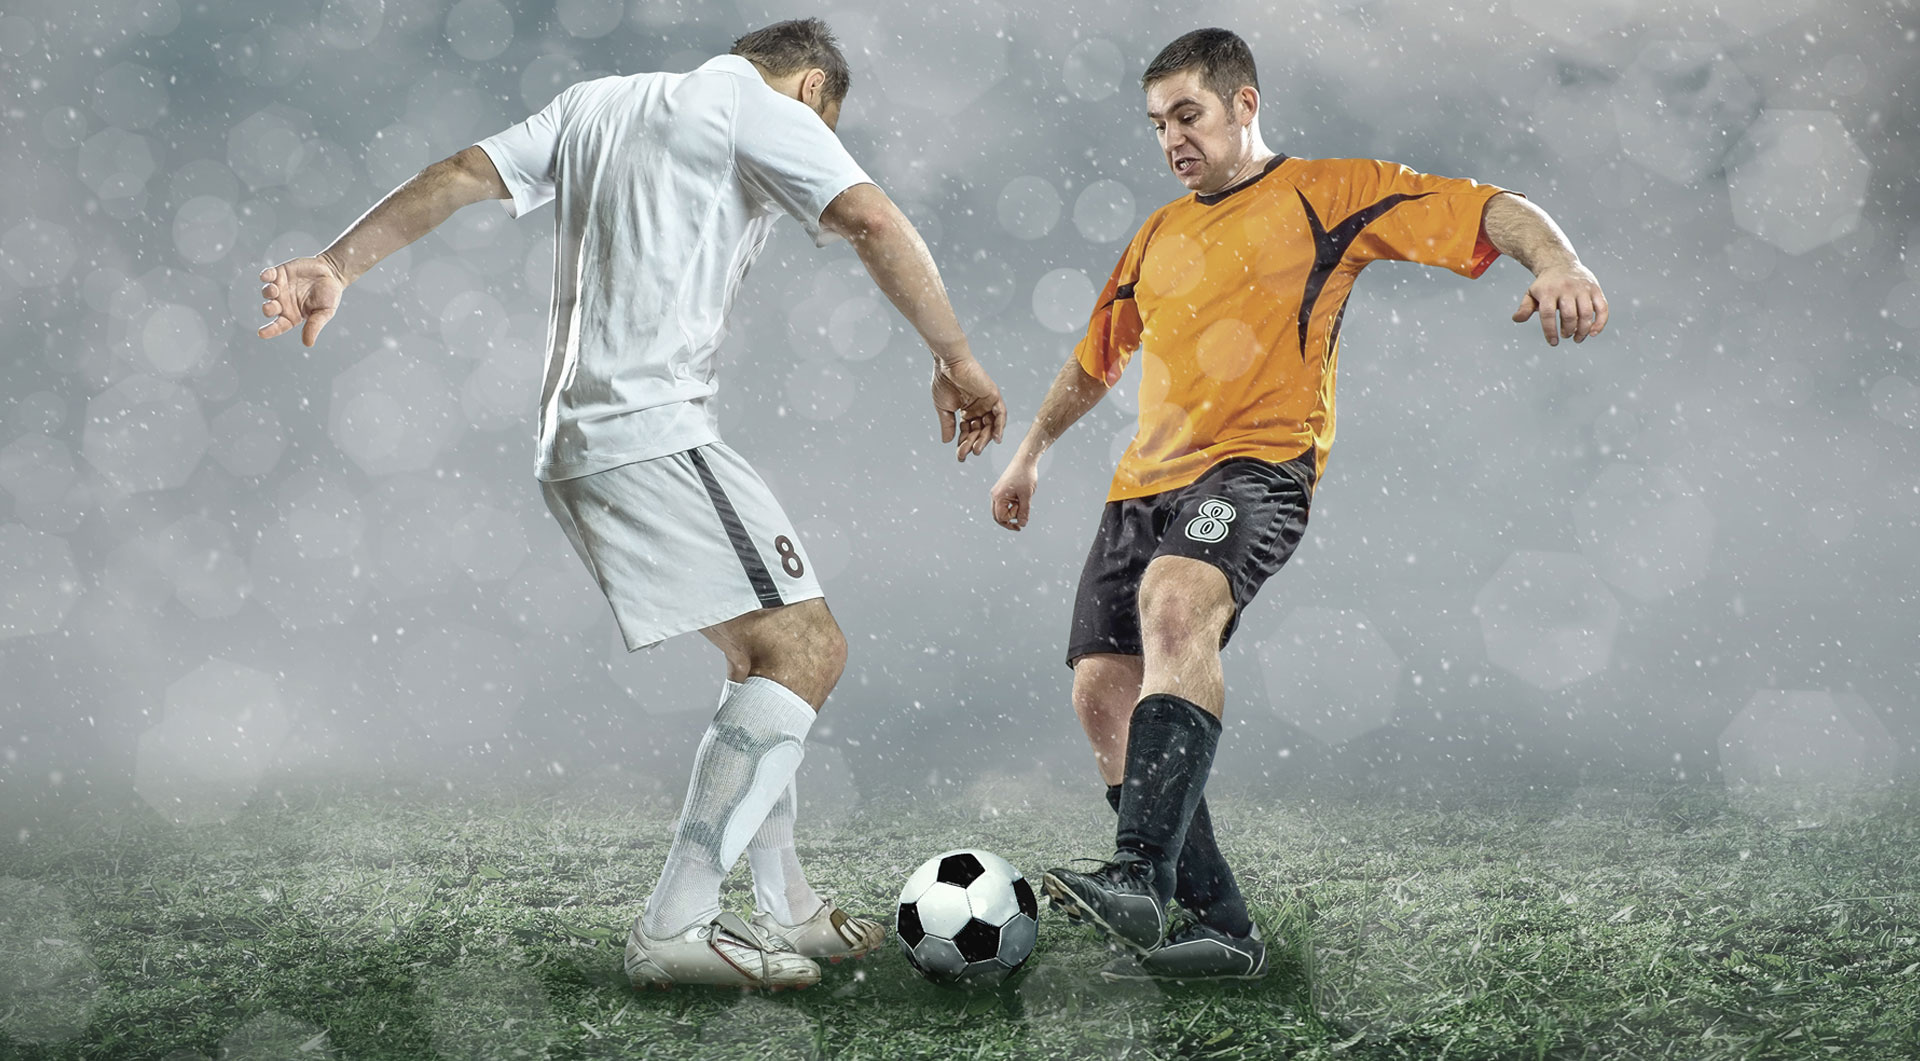 watch-marinko-matosevic-vs-roger-federer-us-open-1st-round-online